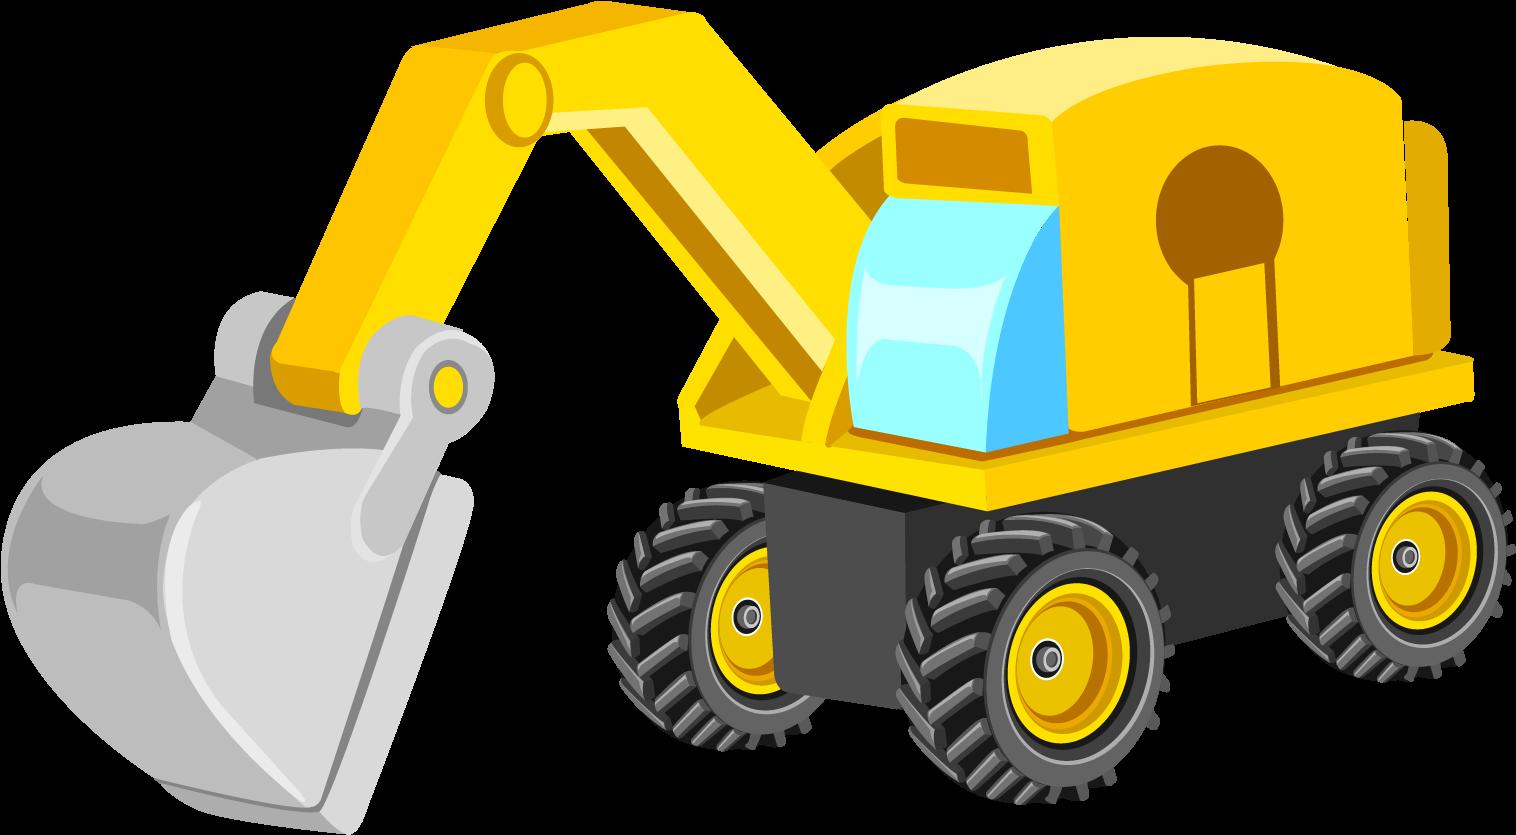 Backhoe clipart trackhoe. Excavator bulldozer machine png